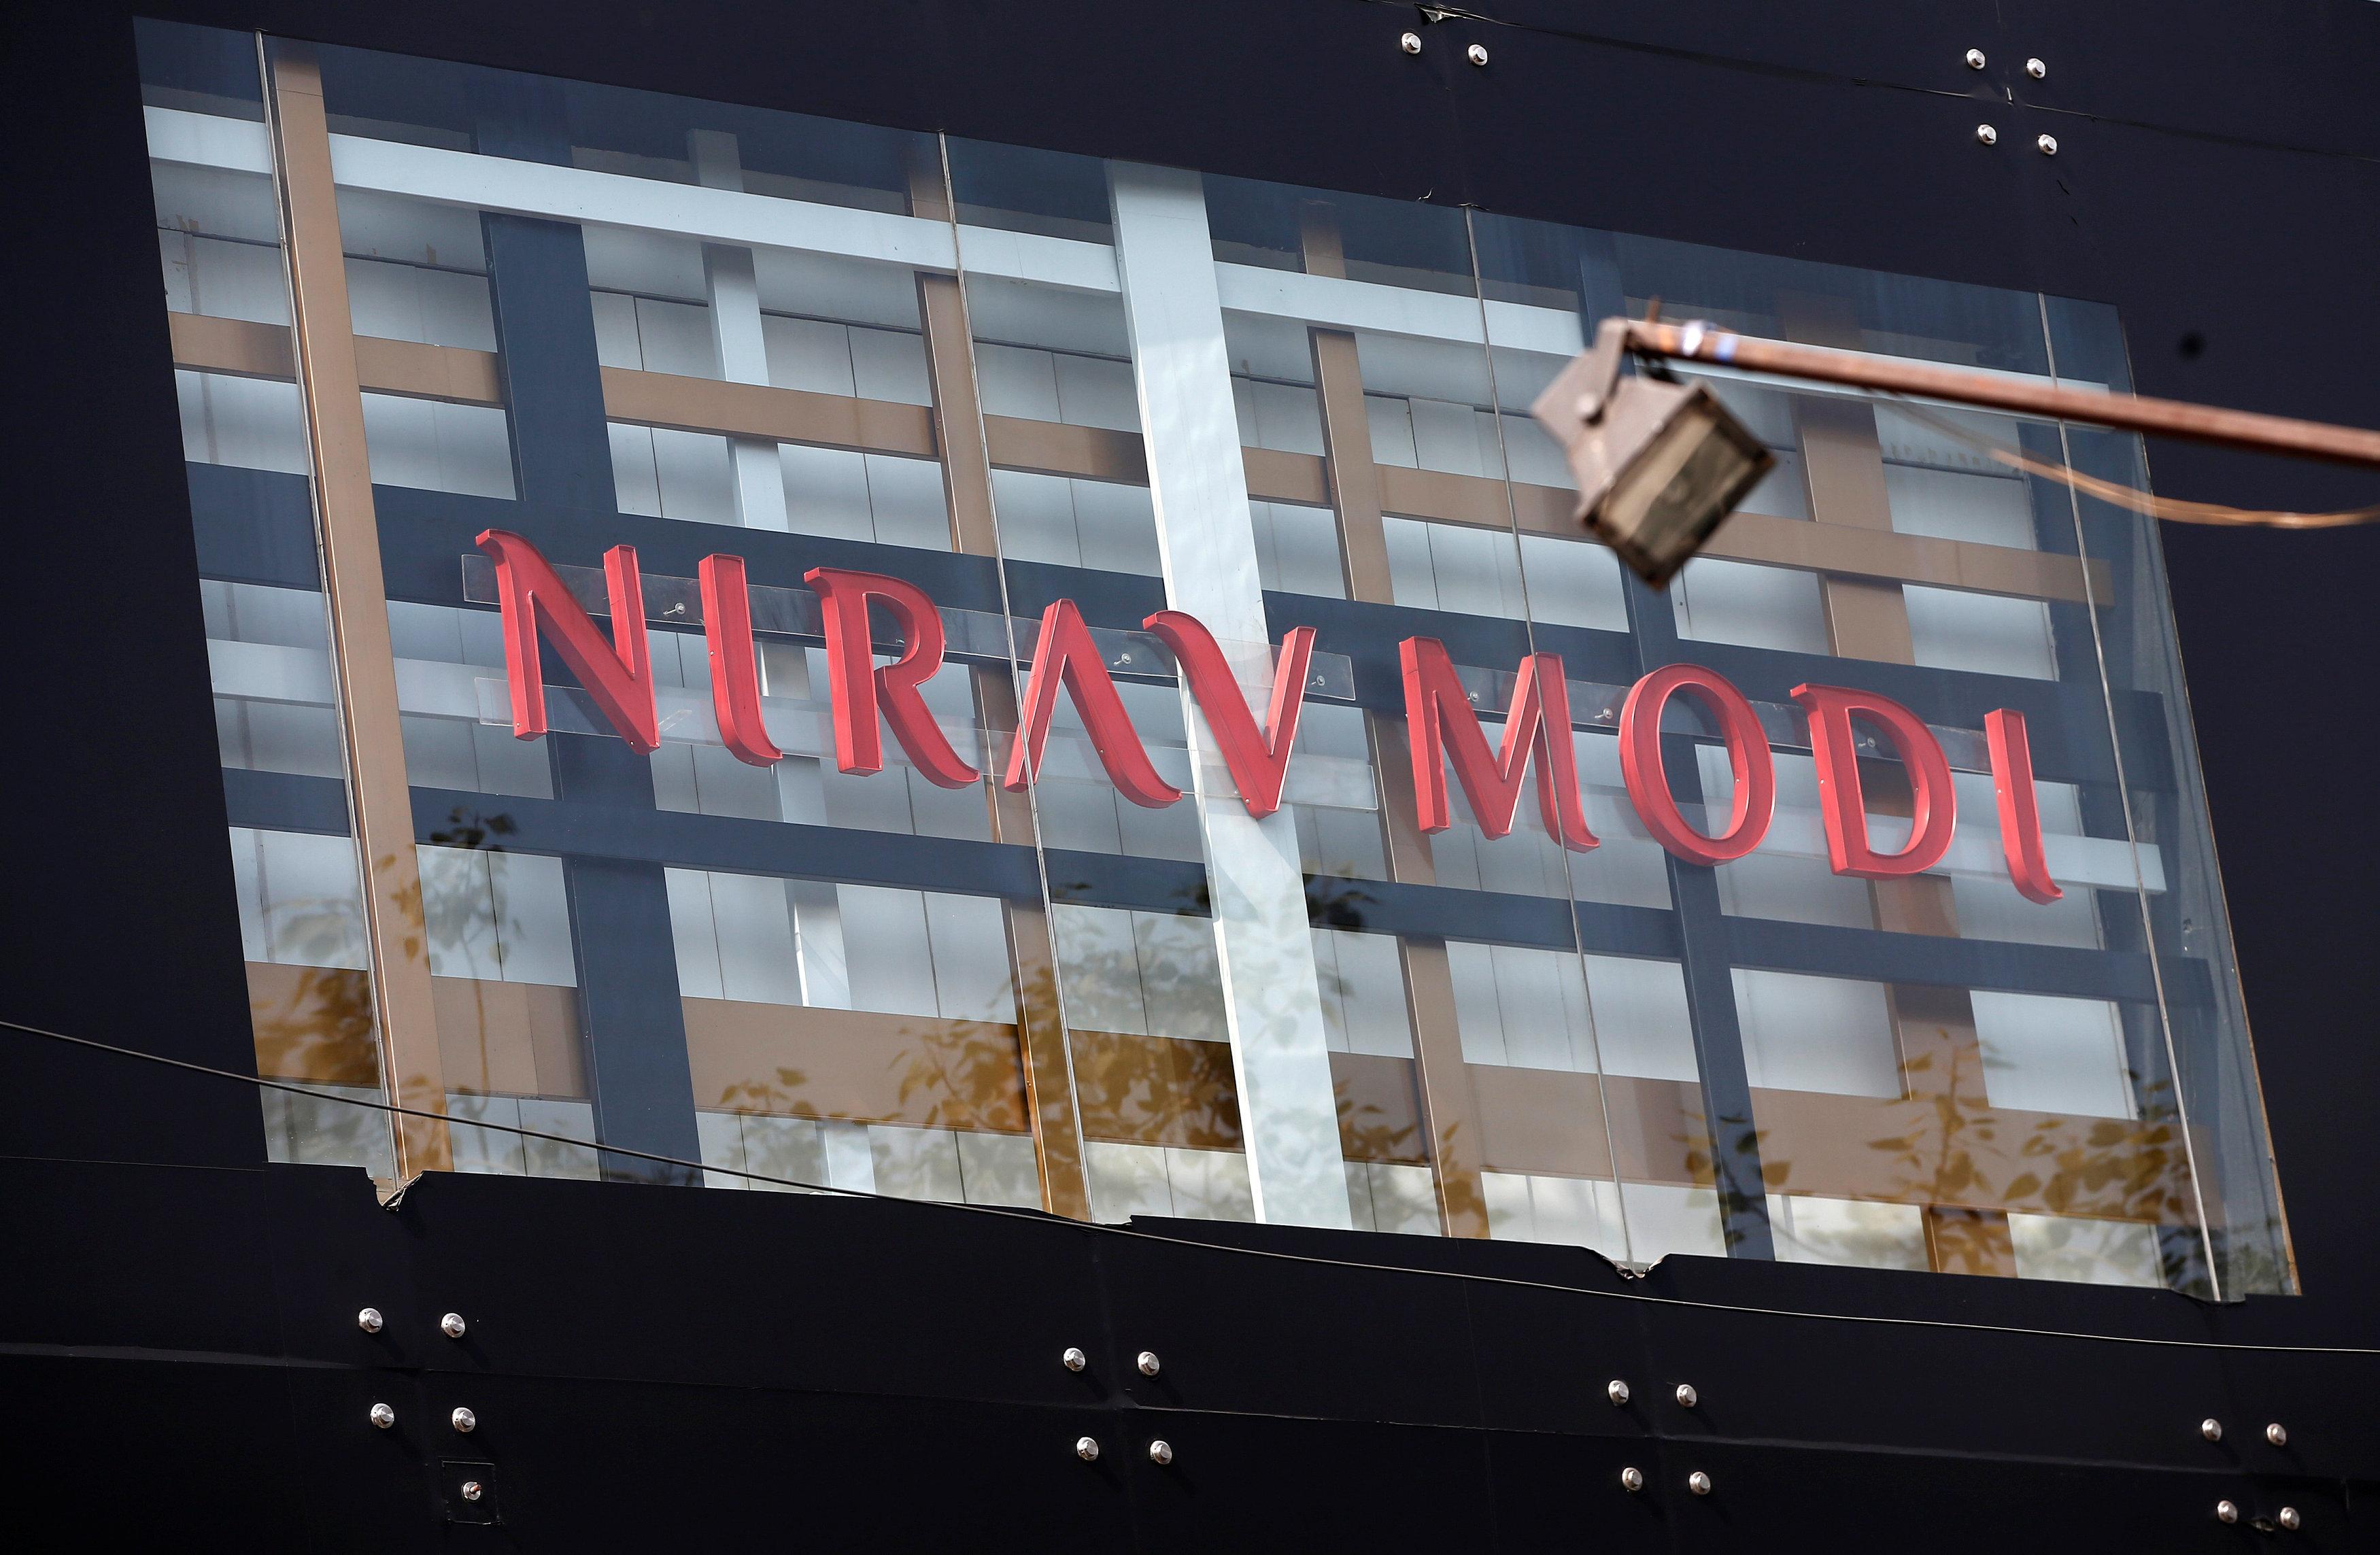 PNB fraud: Times Now tracks Nirav Modi's boutique in London